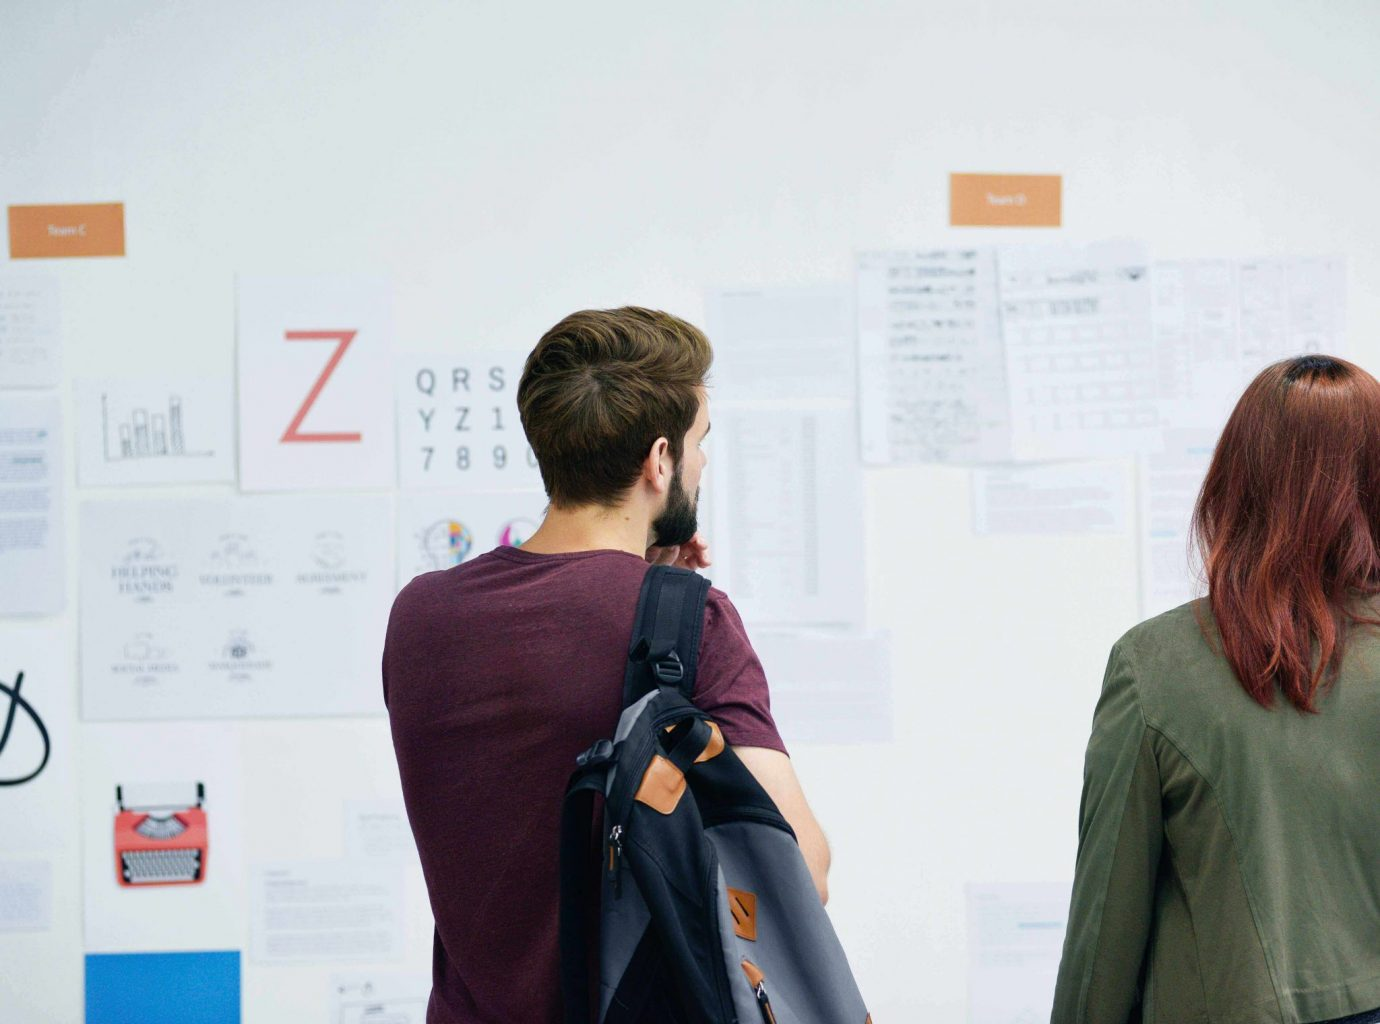 employee training tips 2018